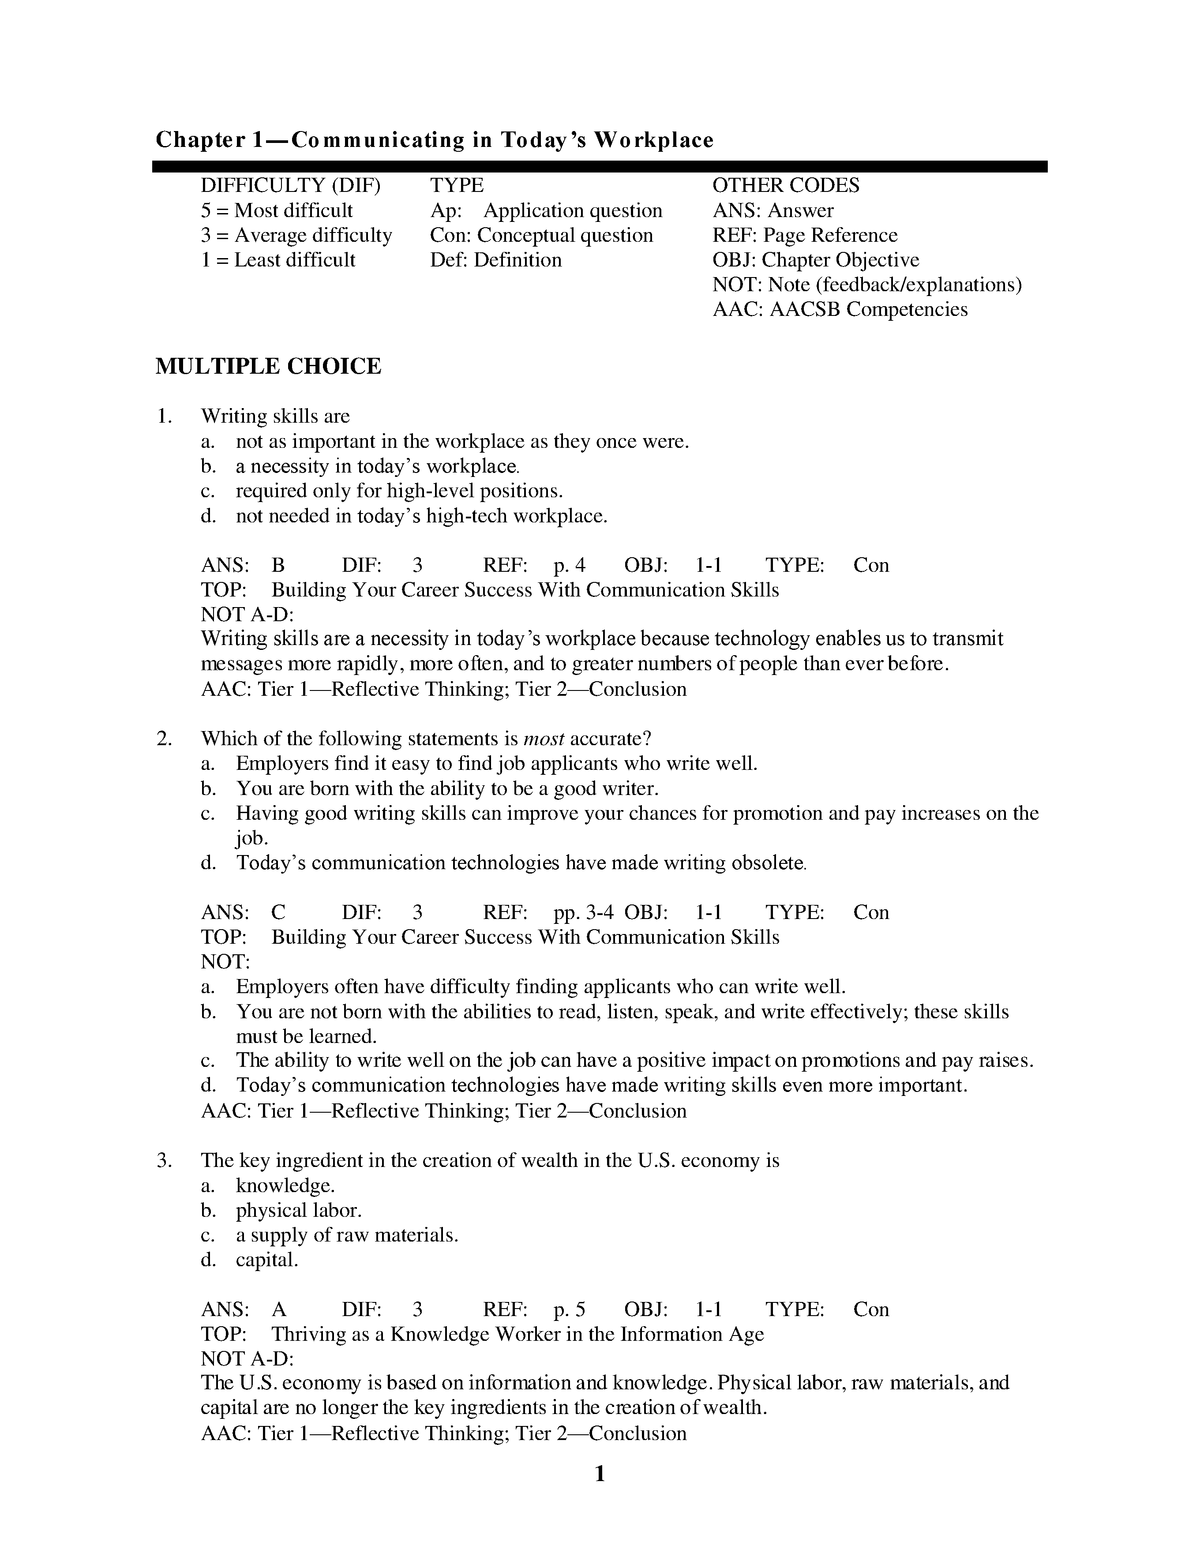 Grade 8 data management test pdf